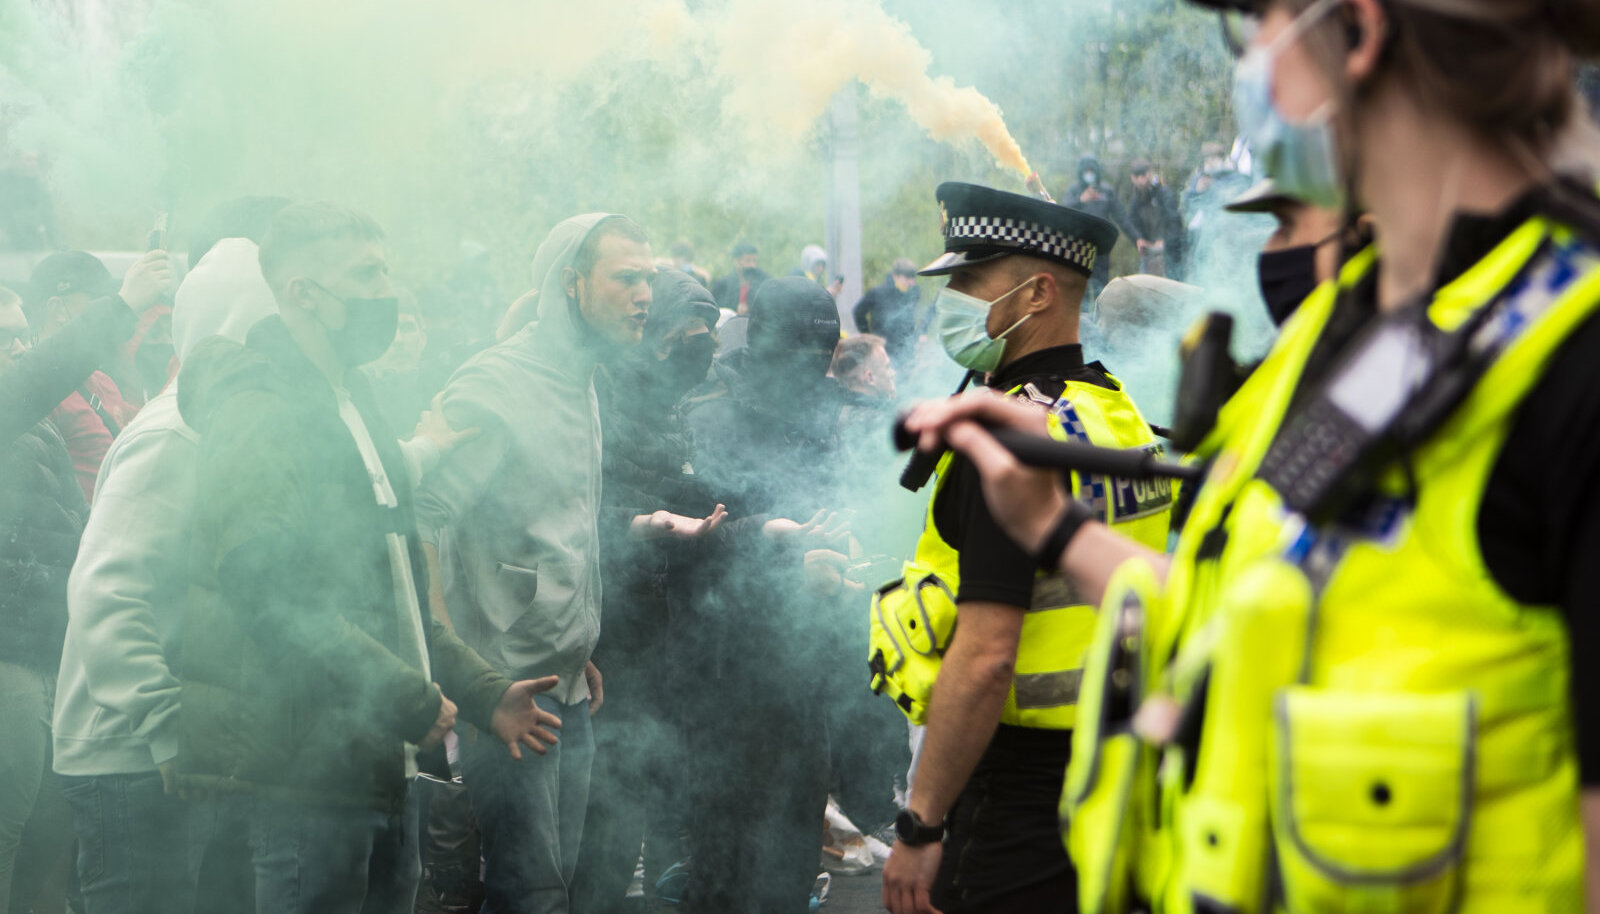 Фанаты бушуют в Манчестере